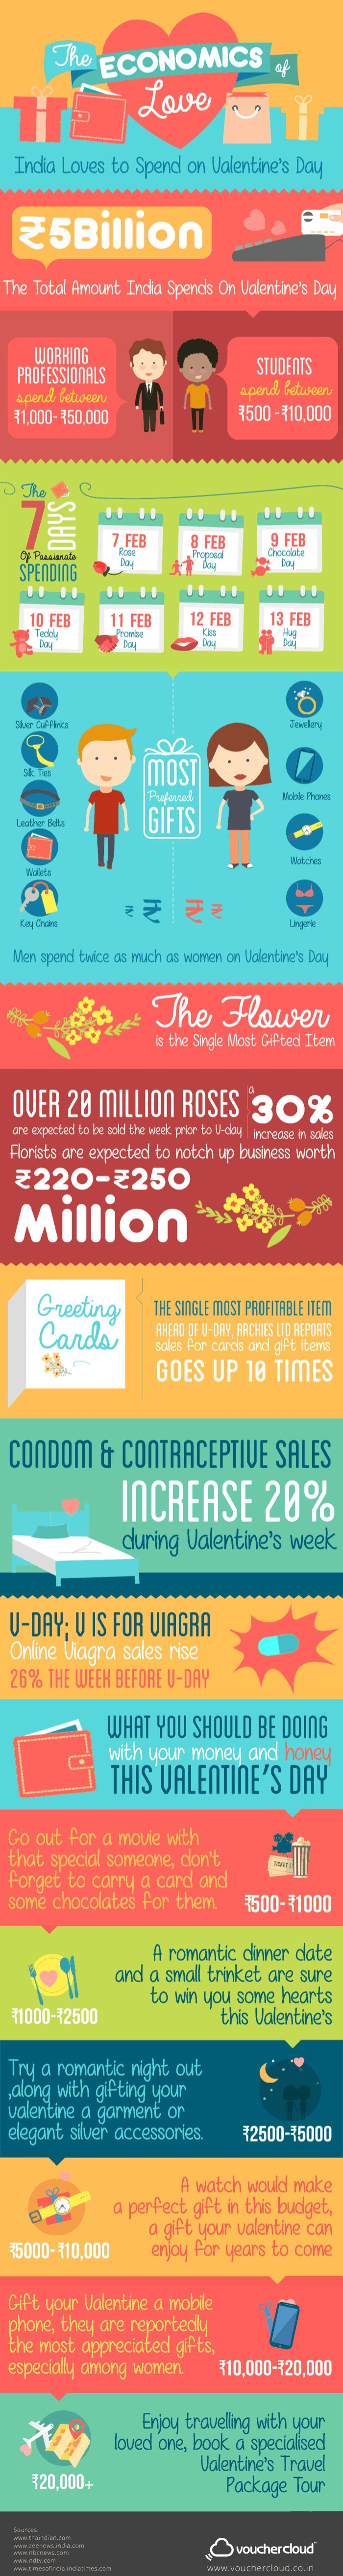 The Economics of Love #infographic #Love #ValentineDay #Relationship